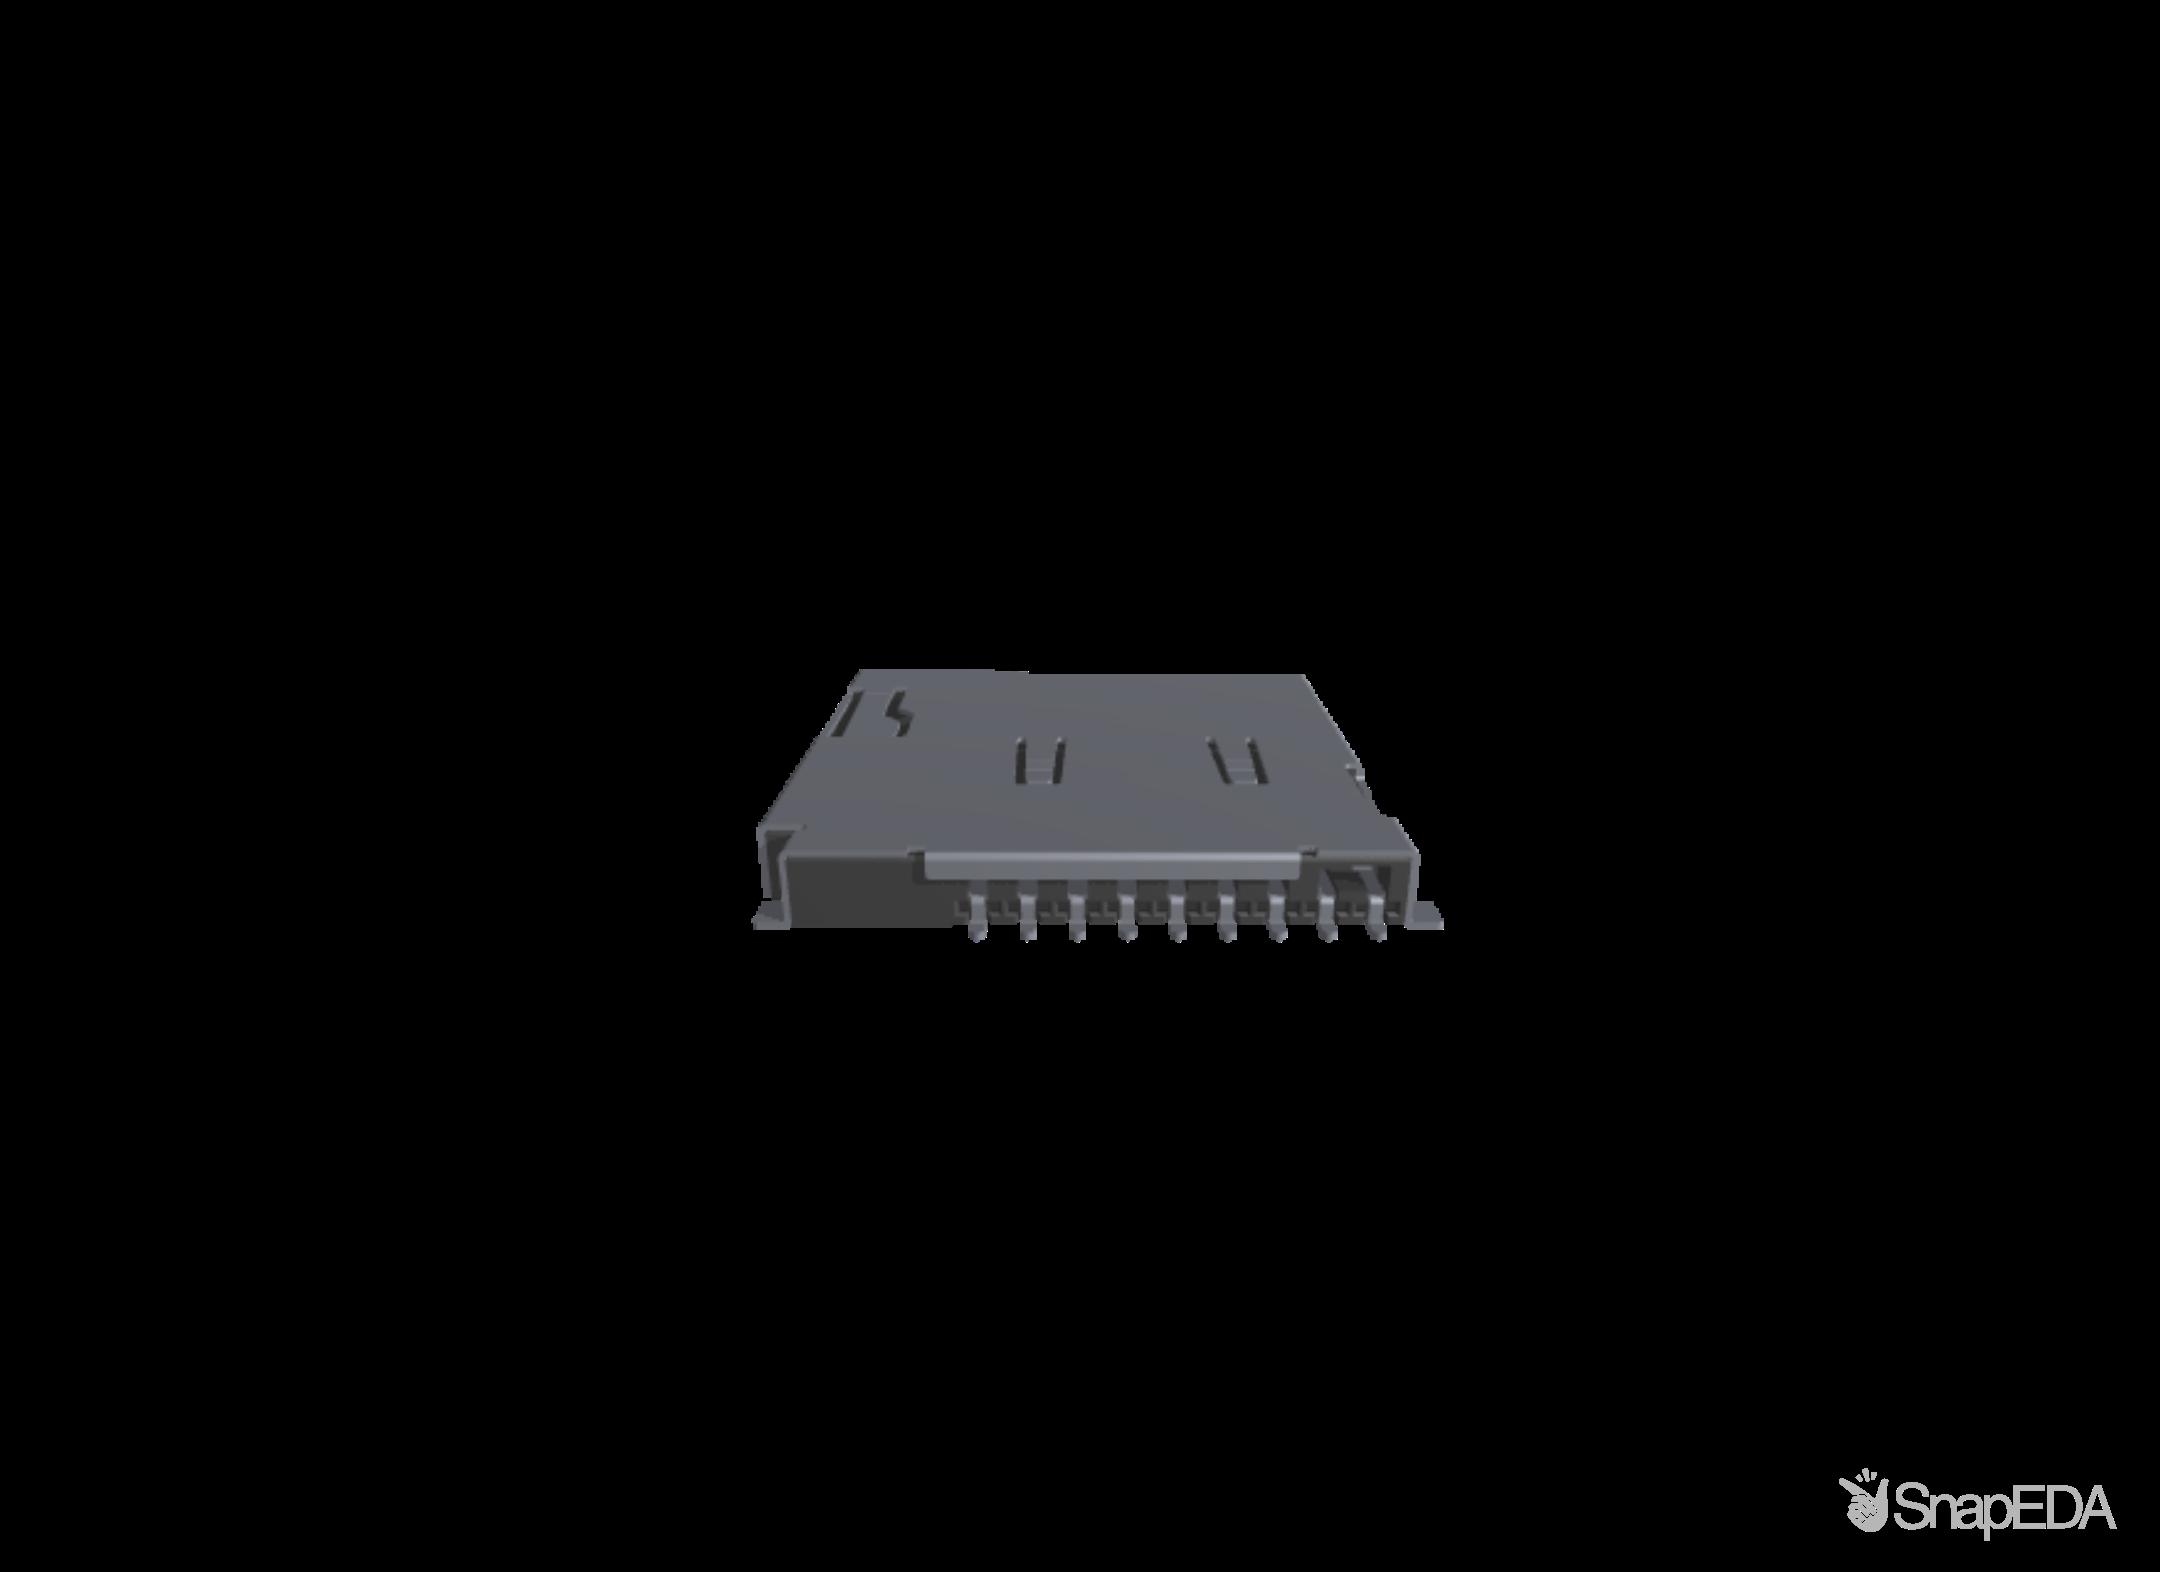 ST-TF-003A 3D Model